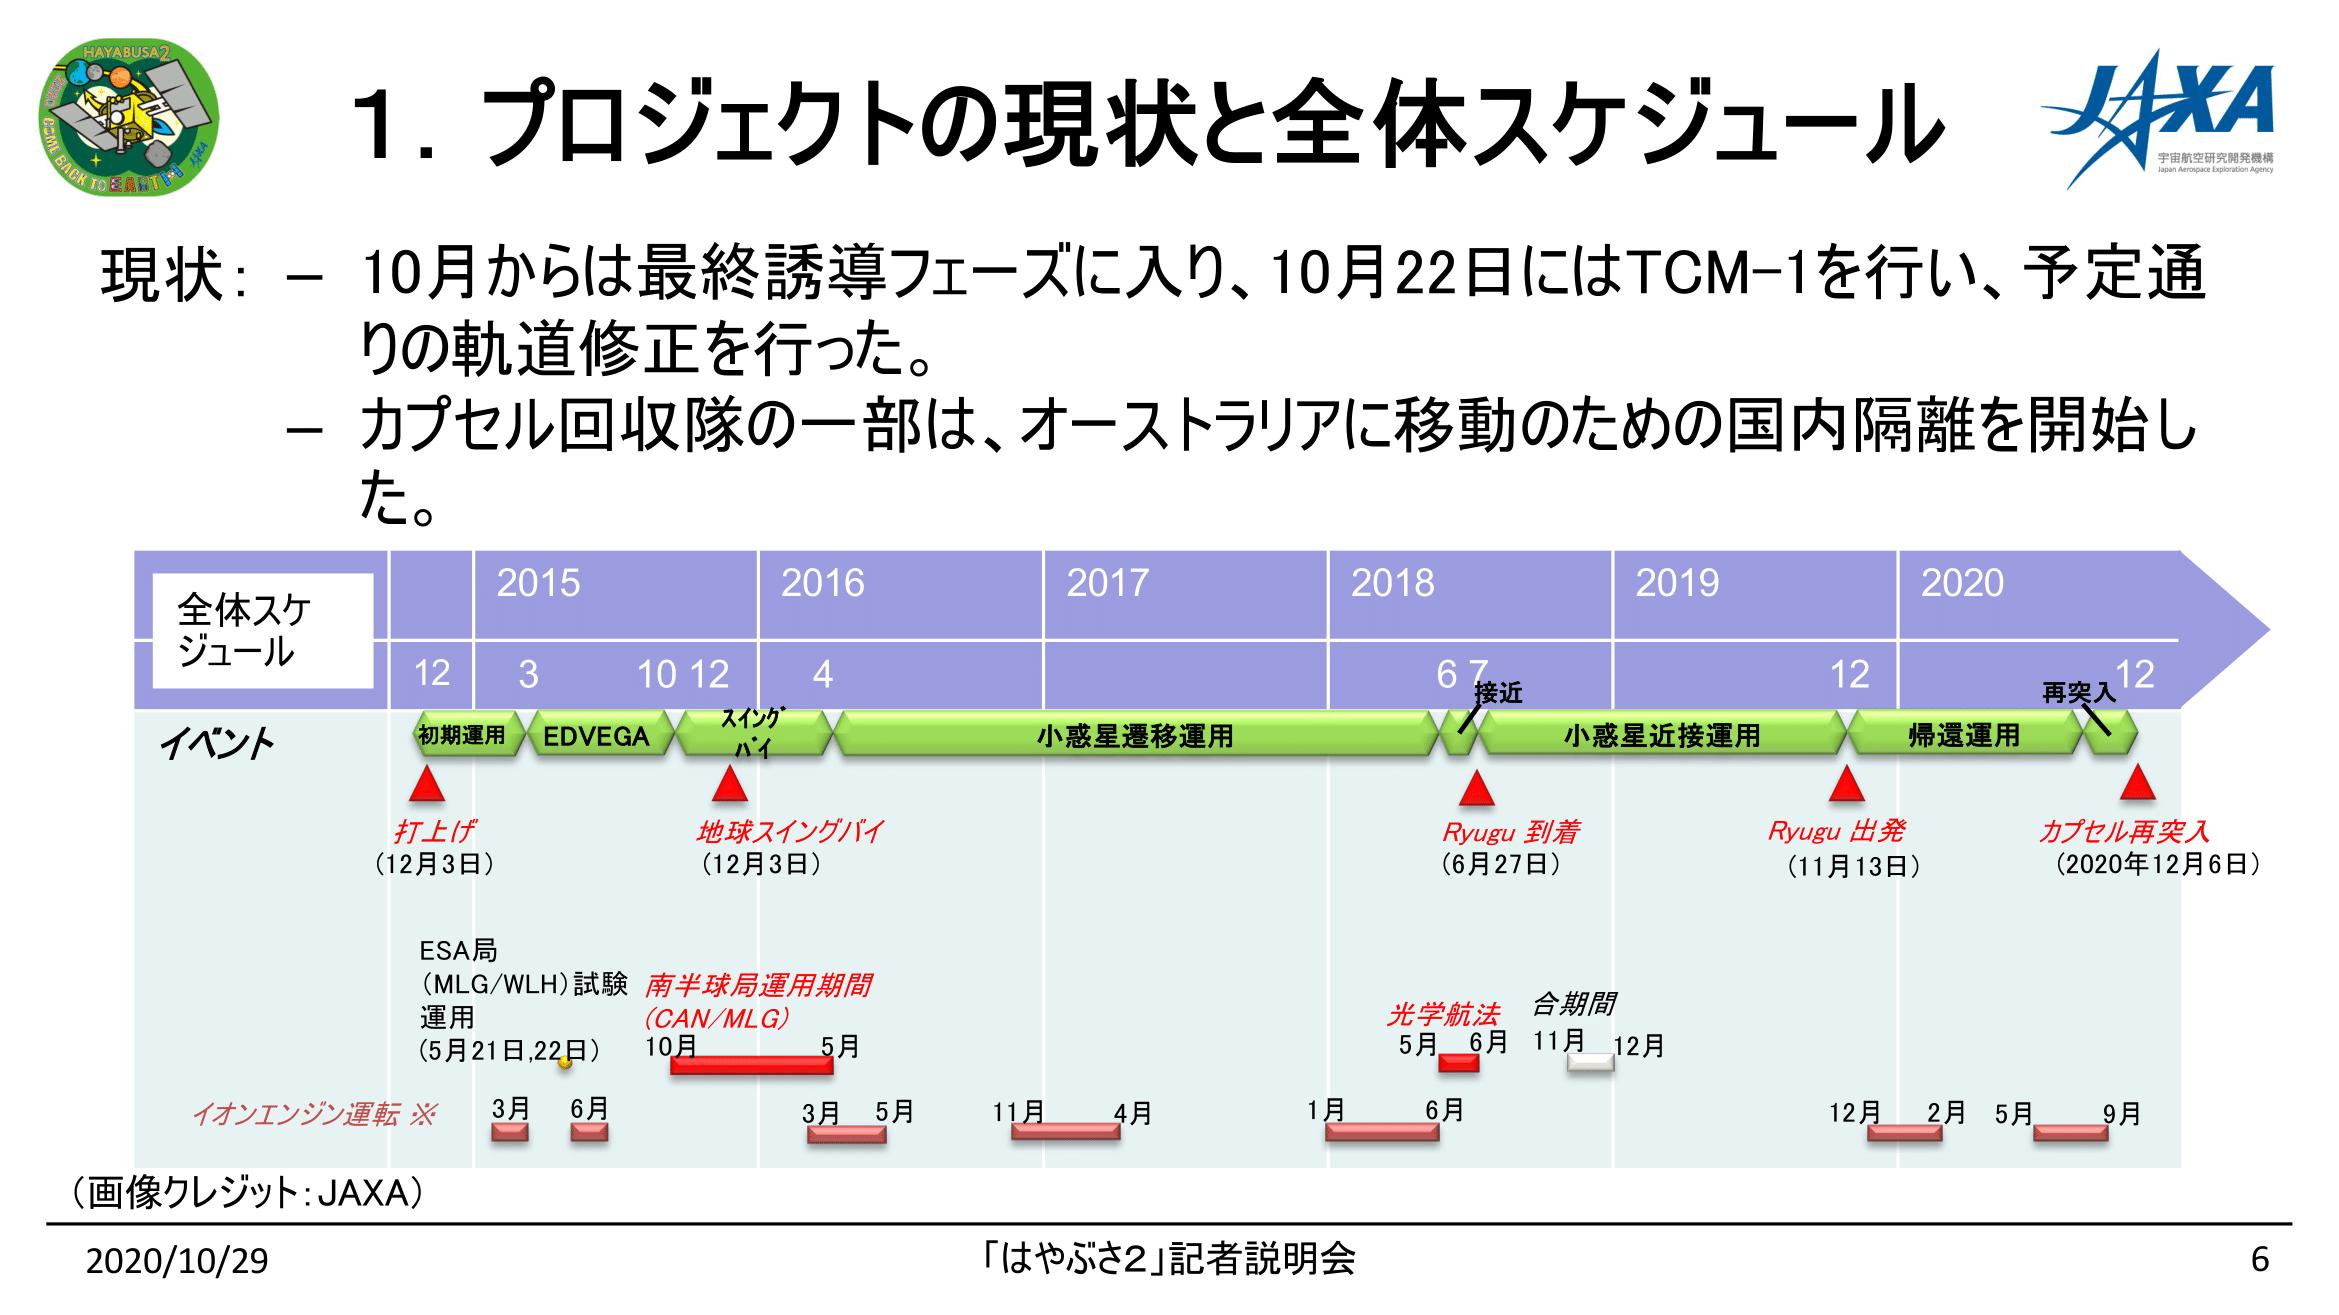 f:id:Imamura:20201029161241p:plain